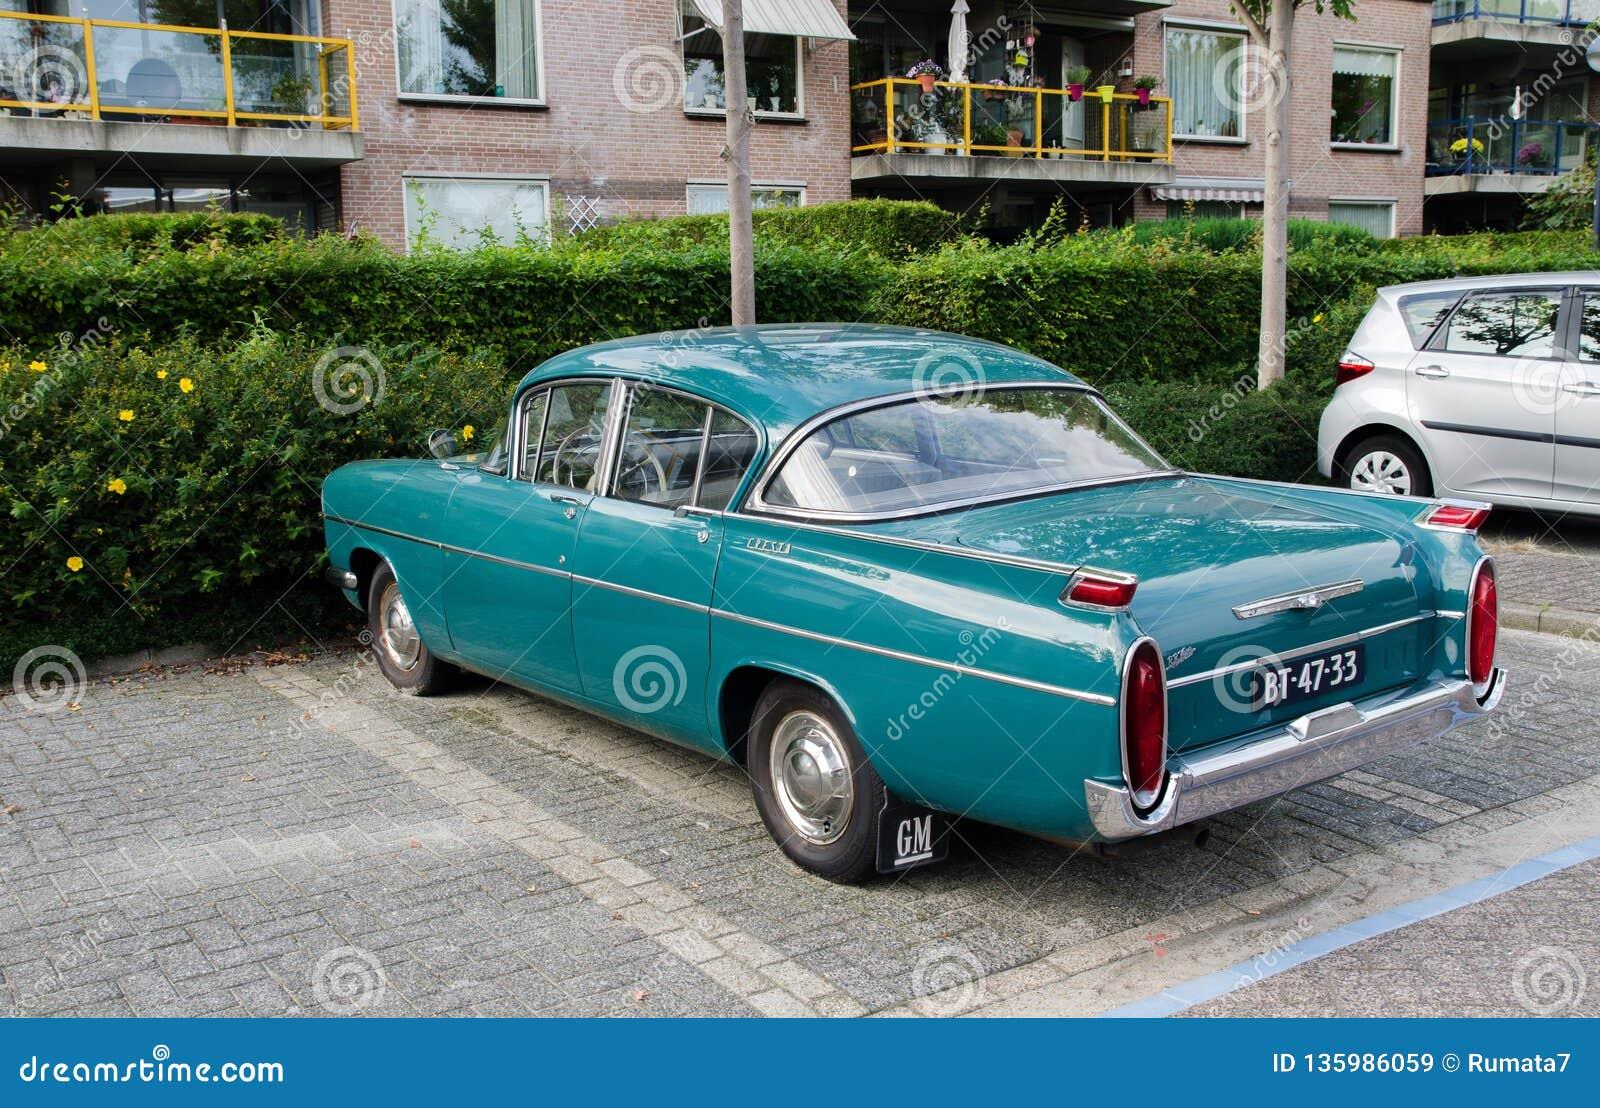 #pha.025697 Photo VAUXHALL CRESTA DELUXE SALOON 1971-1972 Car Auto